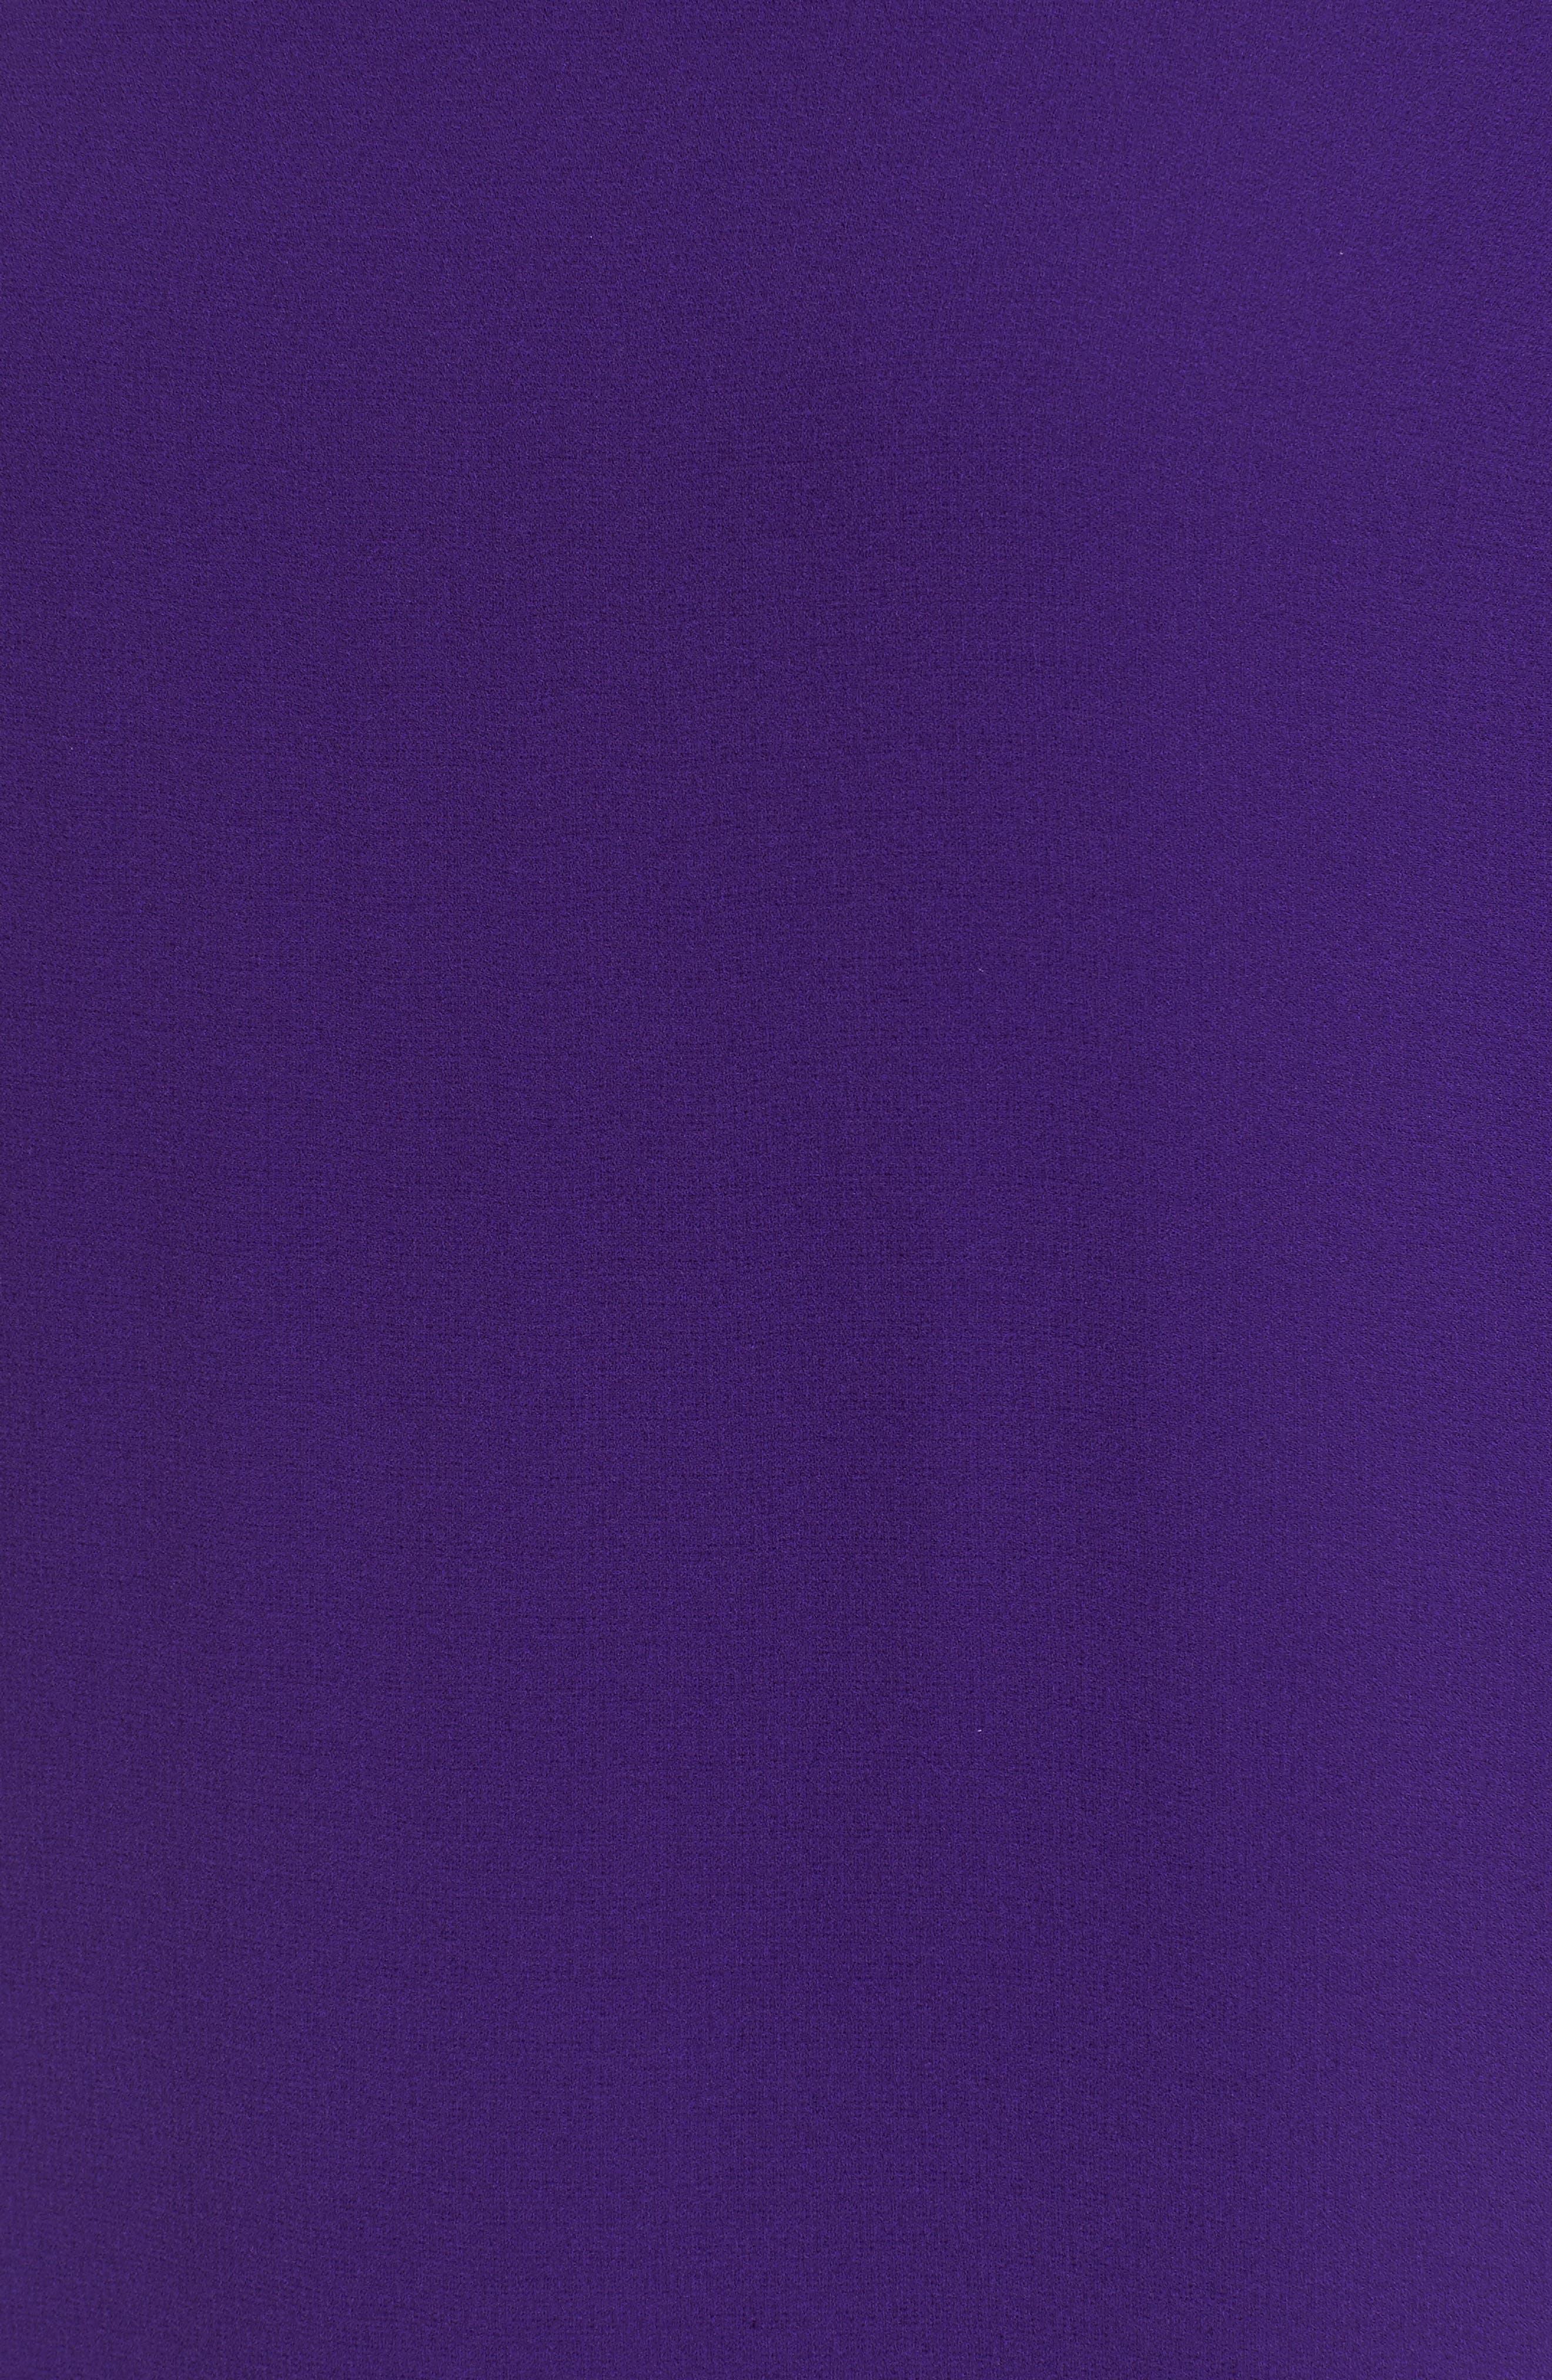 Silk Shift Dress,                             Alternate thumbnail 4, color,                             Ultraviolet